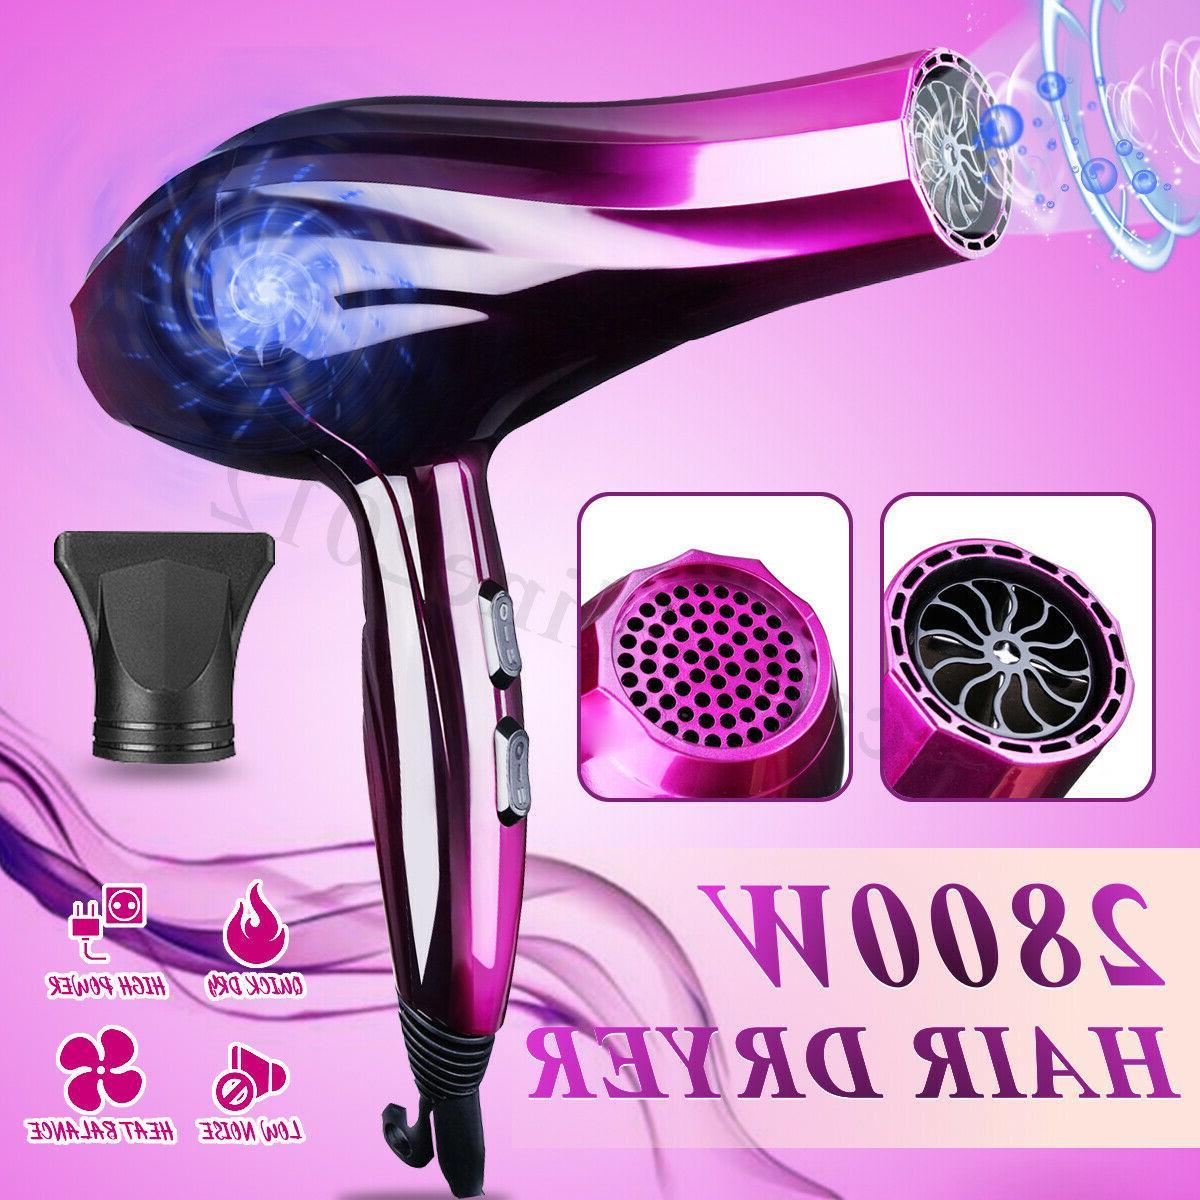 2800w hair blow dryer dry powerful 3